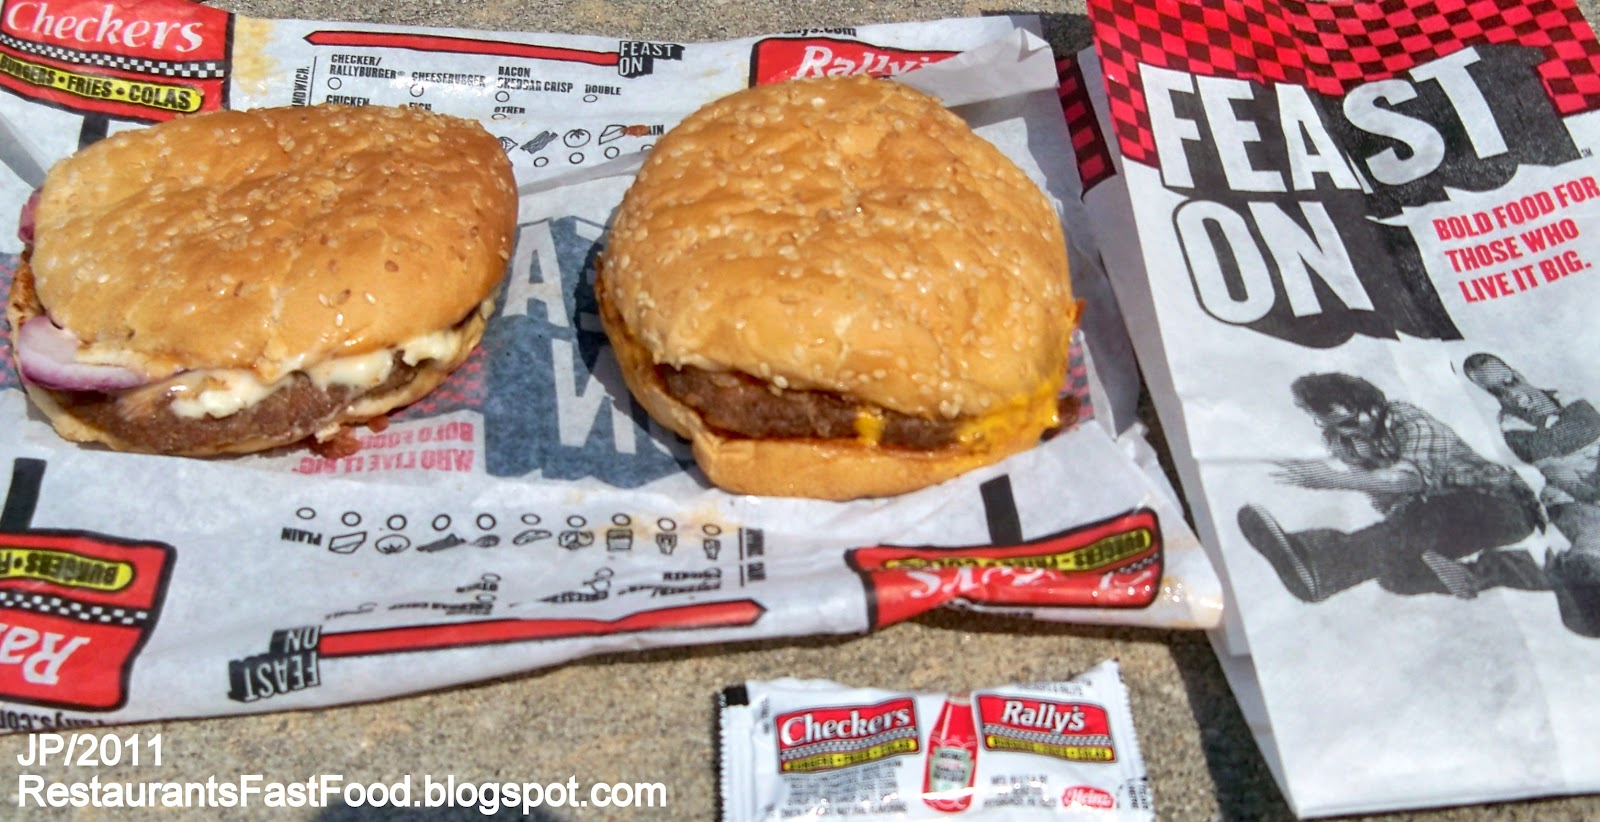 Restaurant fast food menu mcdonald 39 s dq bk hamburger pizza for Checkers fish sandwich